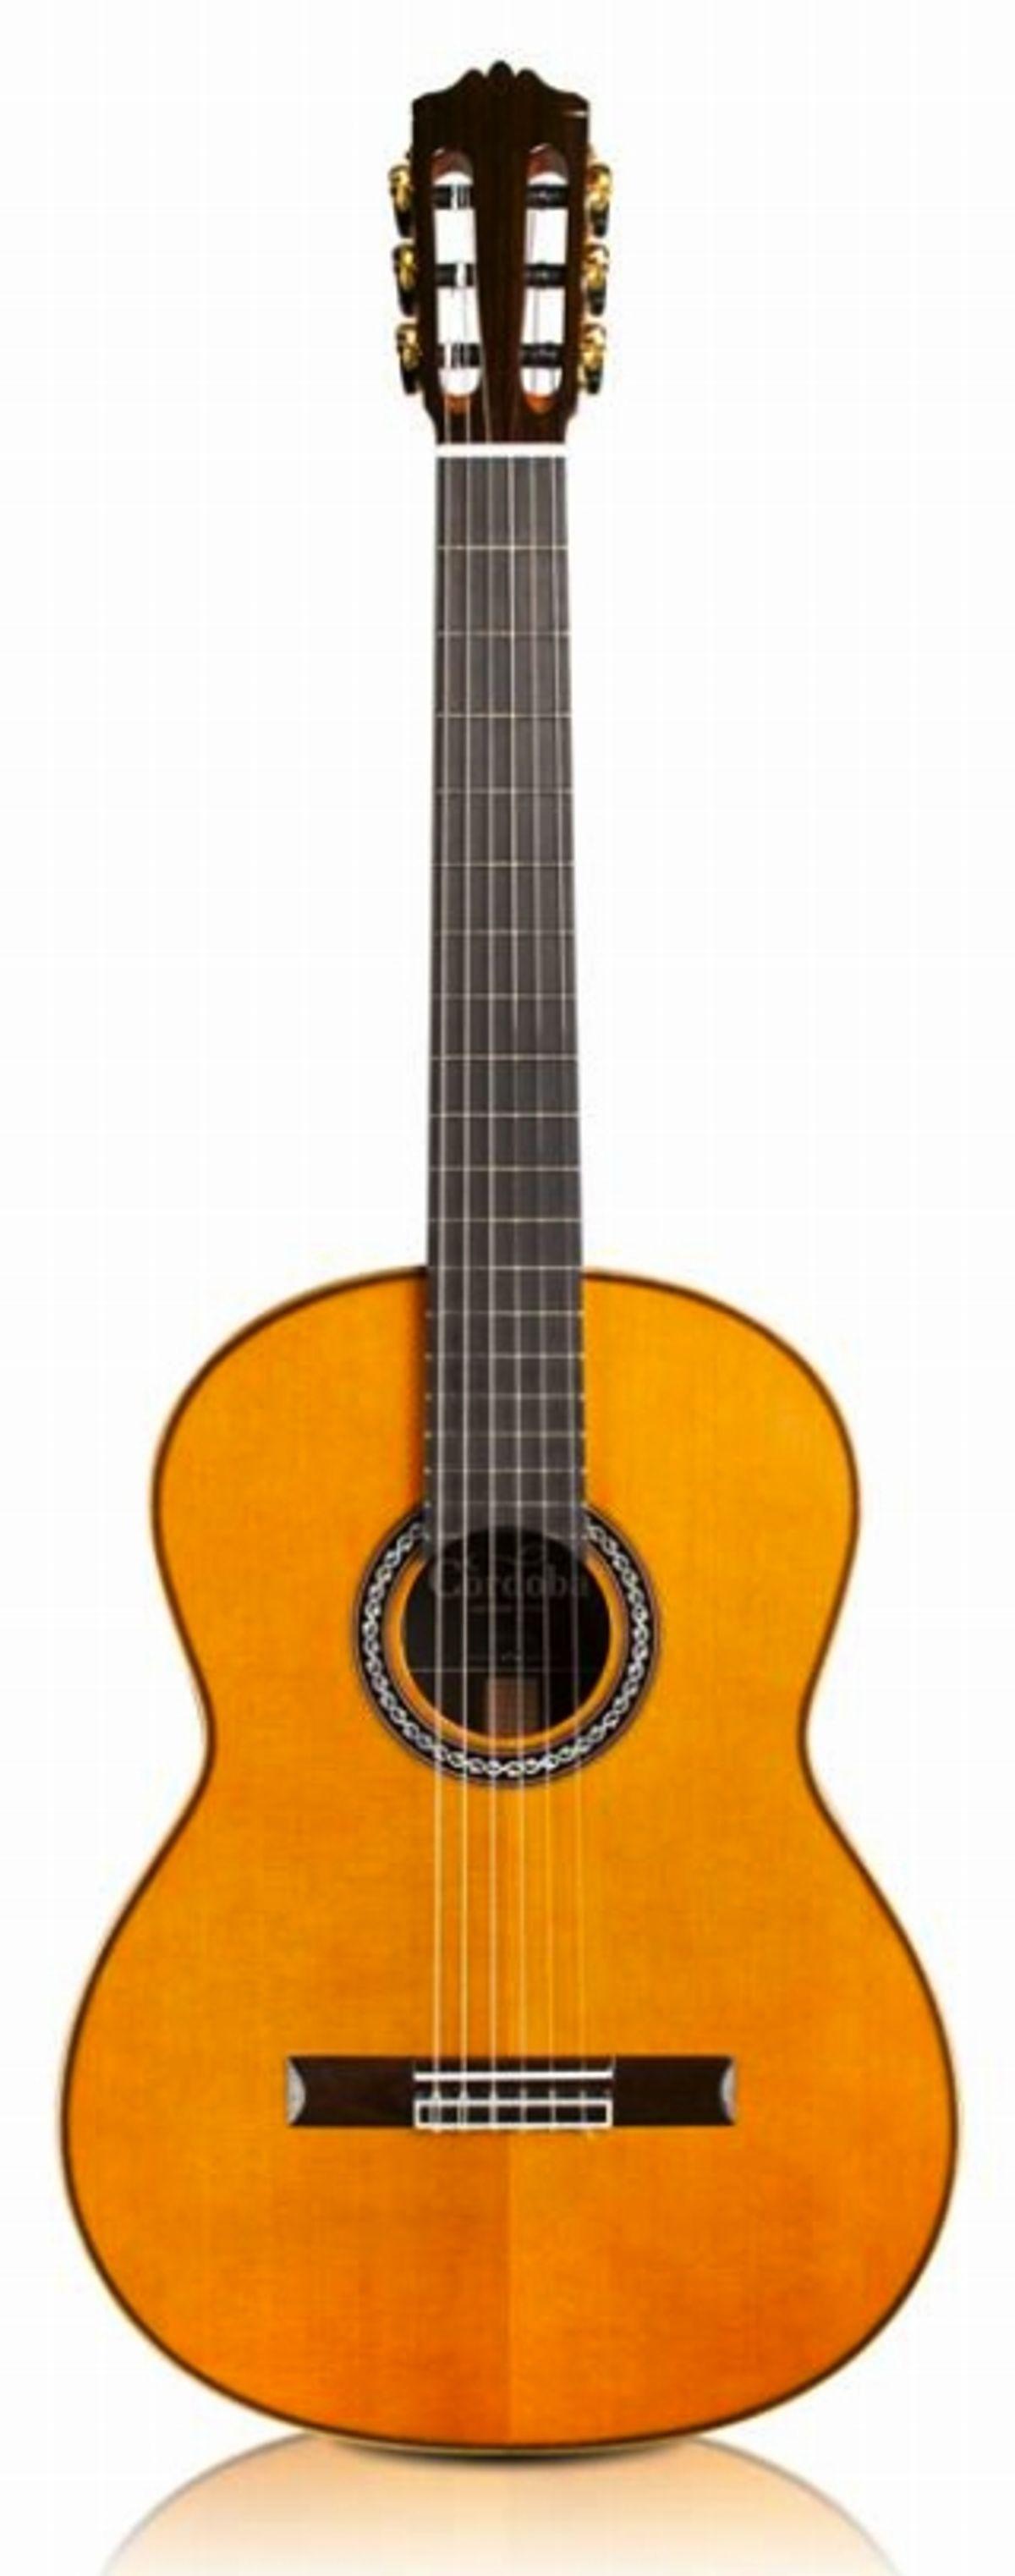 Cordoba Guitars Announces the C12